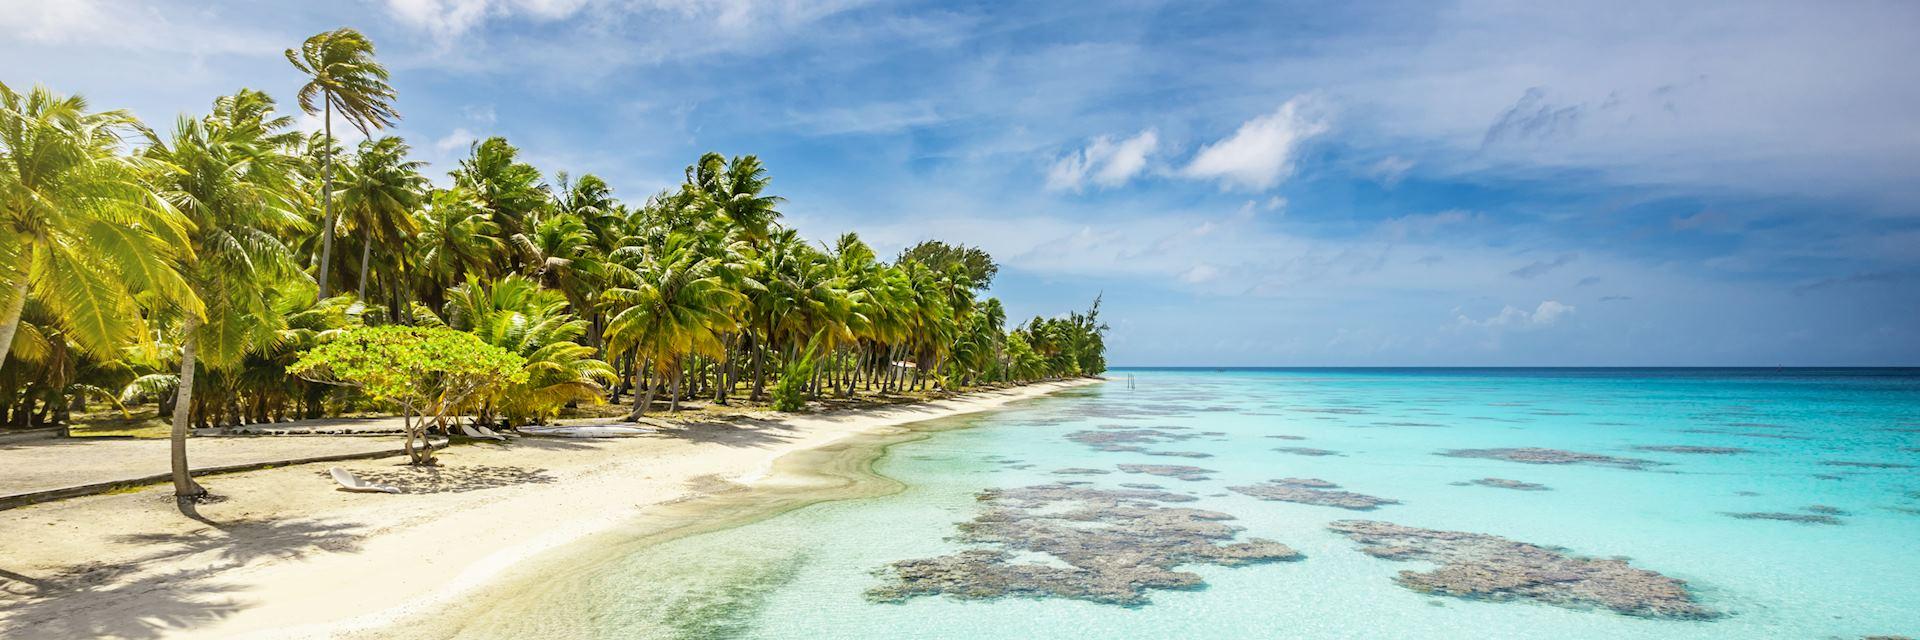 Tuamotu Islands, French Polynesia